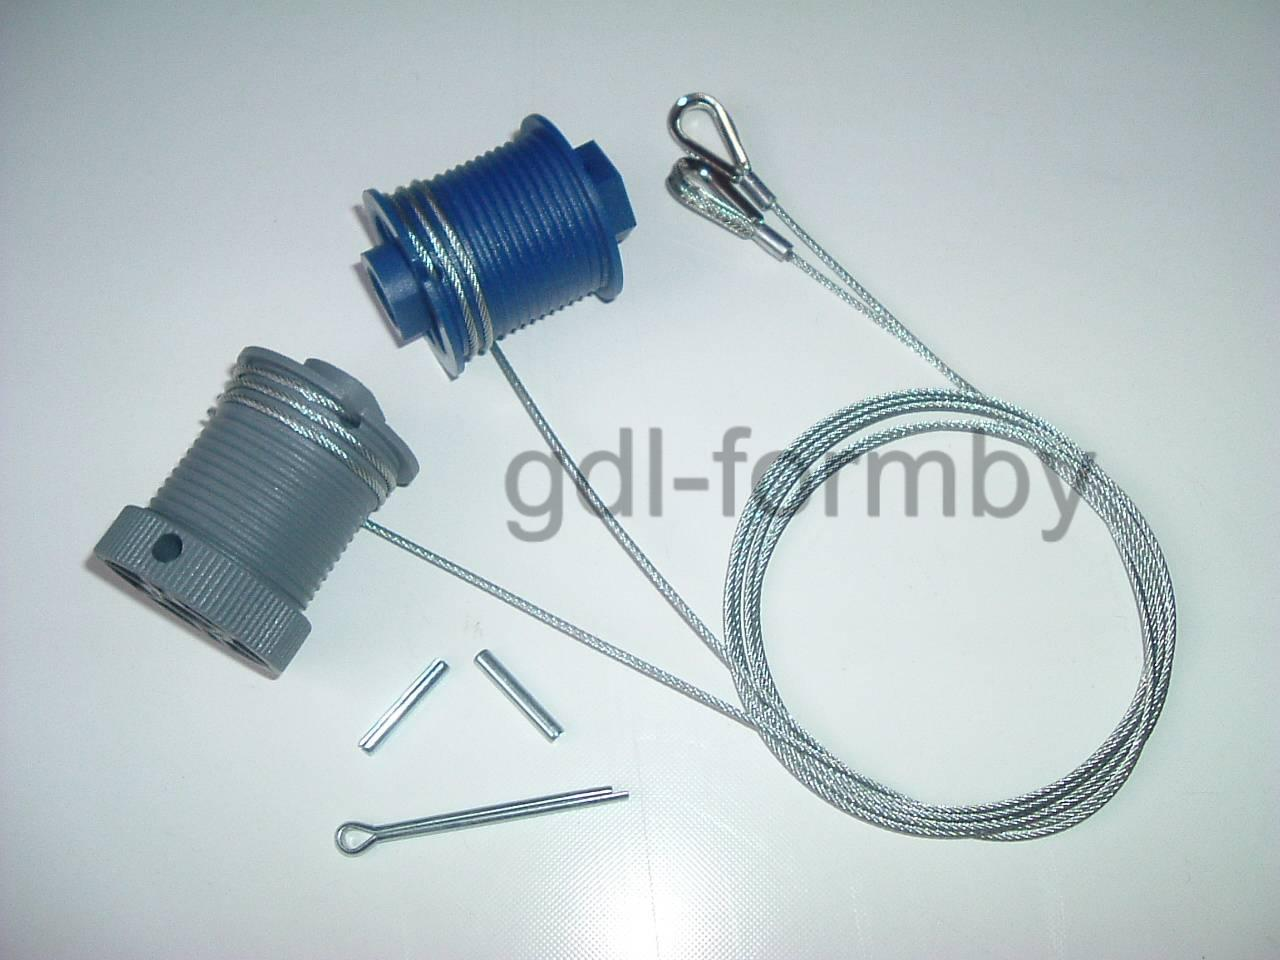 Cardale cd pro safelift anti drop roller spindles cables wessex cardale cd pro safelift anti drop roller spindles rubansaba